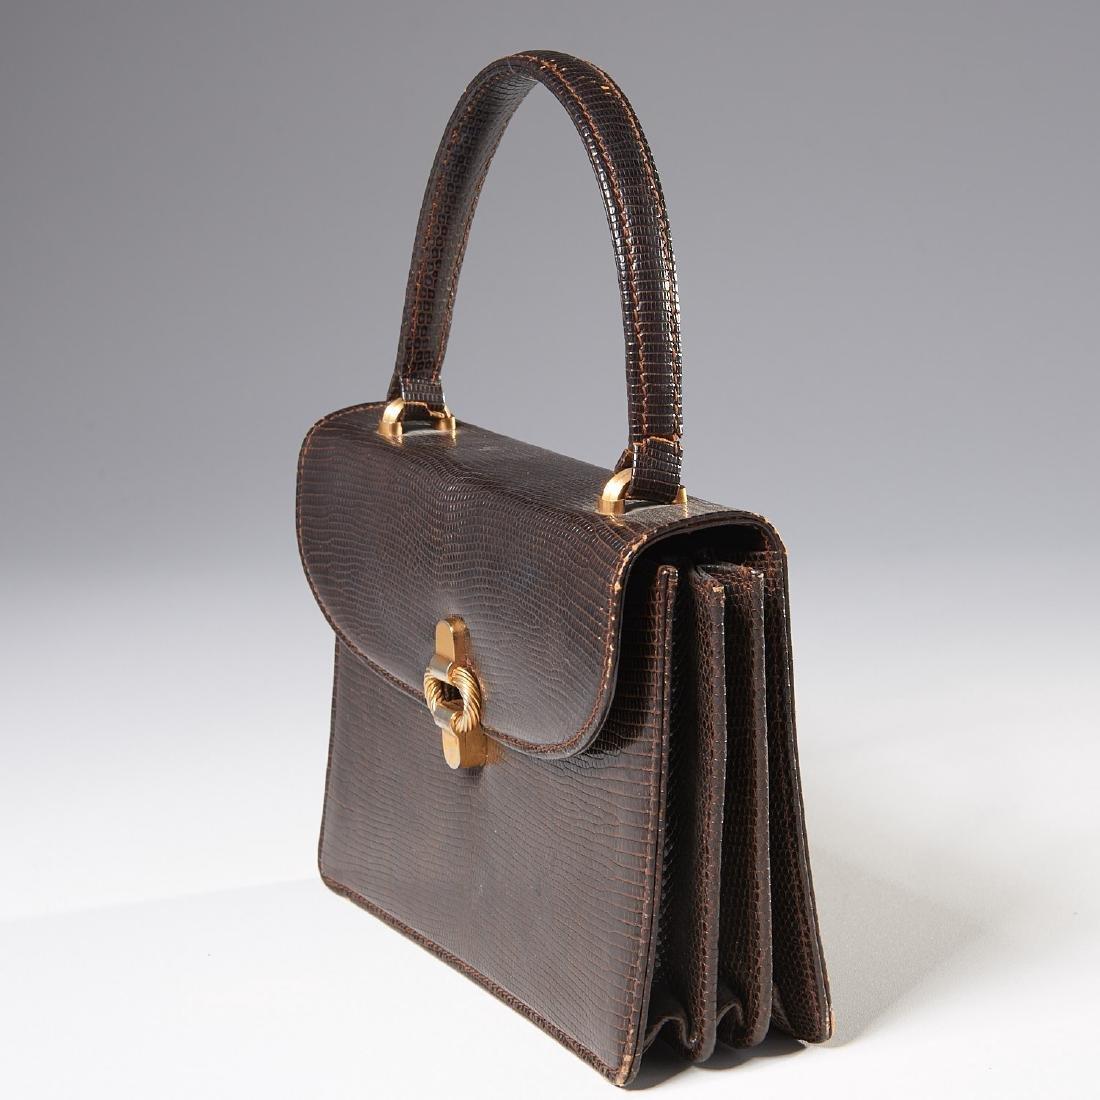 Gucci brown lizard handbag - 2